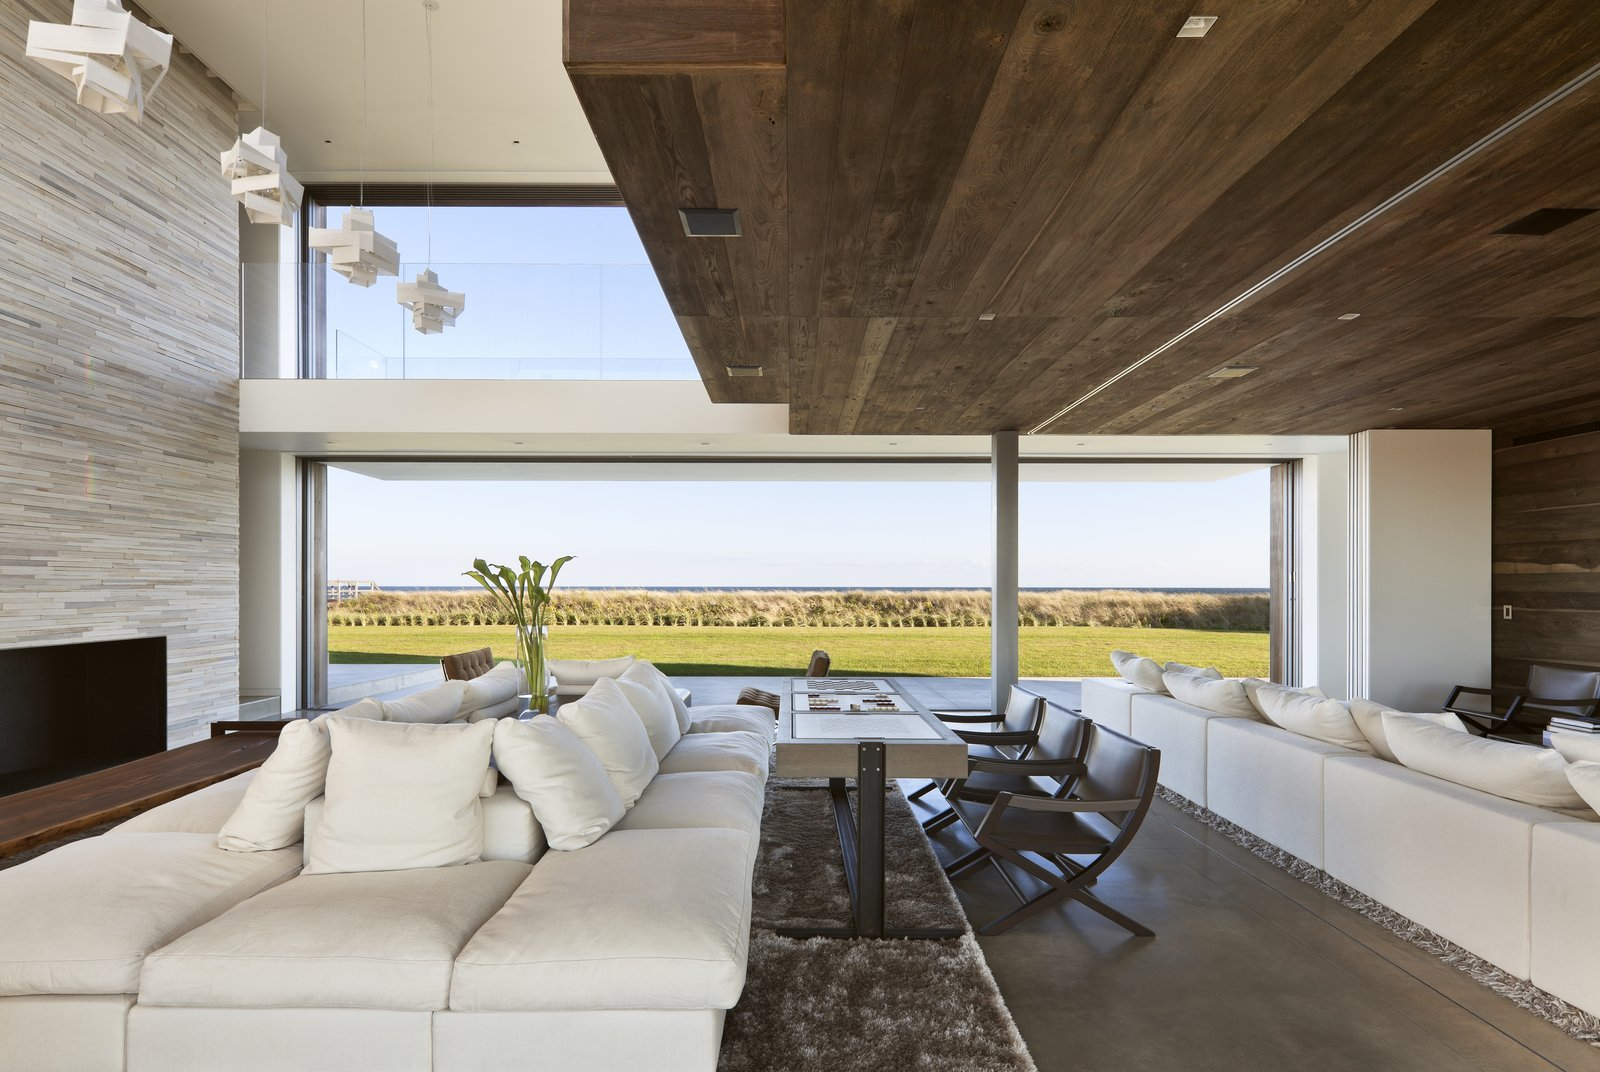 Living Room, Sectional, Sofa, Ribbon Fireplace, Ceiling Lighting, Pendant Lighting, Accent Lighting, and Recessed Lighting  Sagaponack, NY